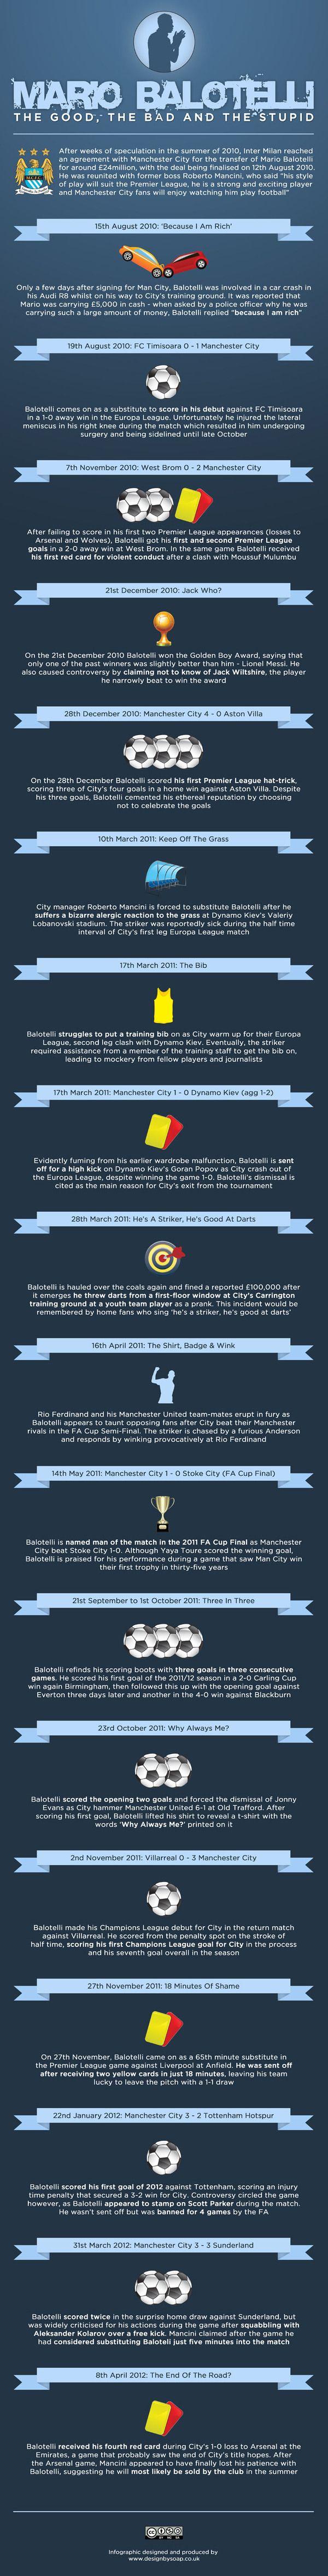 42 Best Ideas About Balotelli On Pinterest Football Semi Final